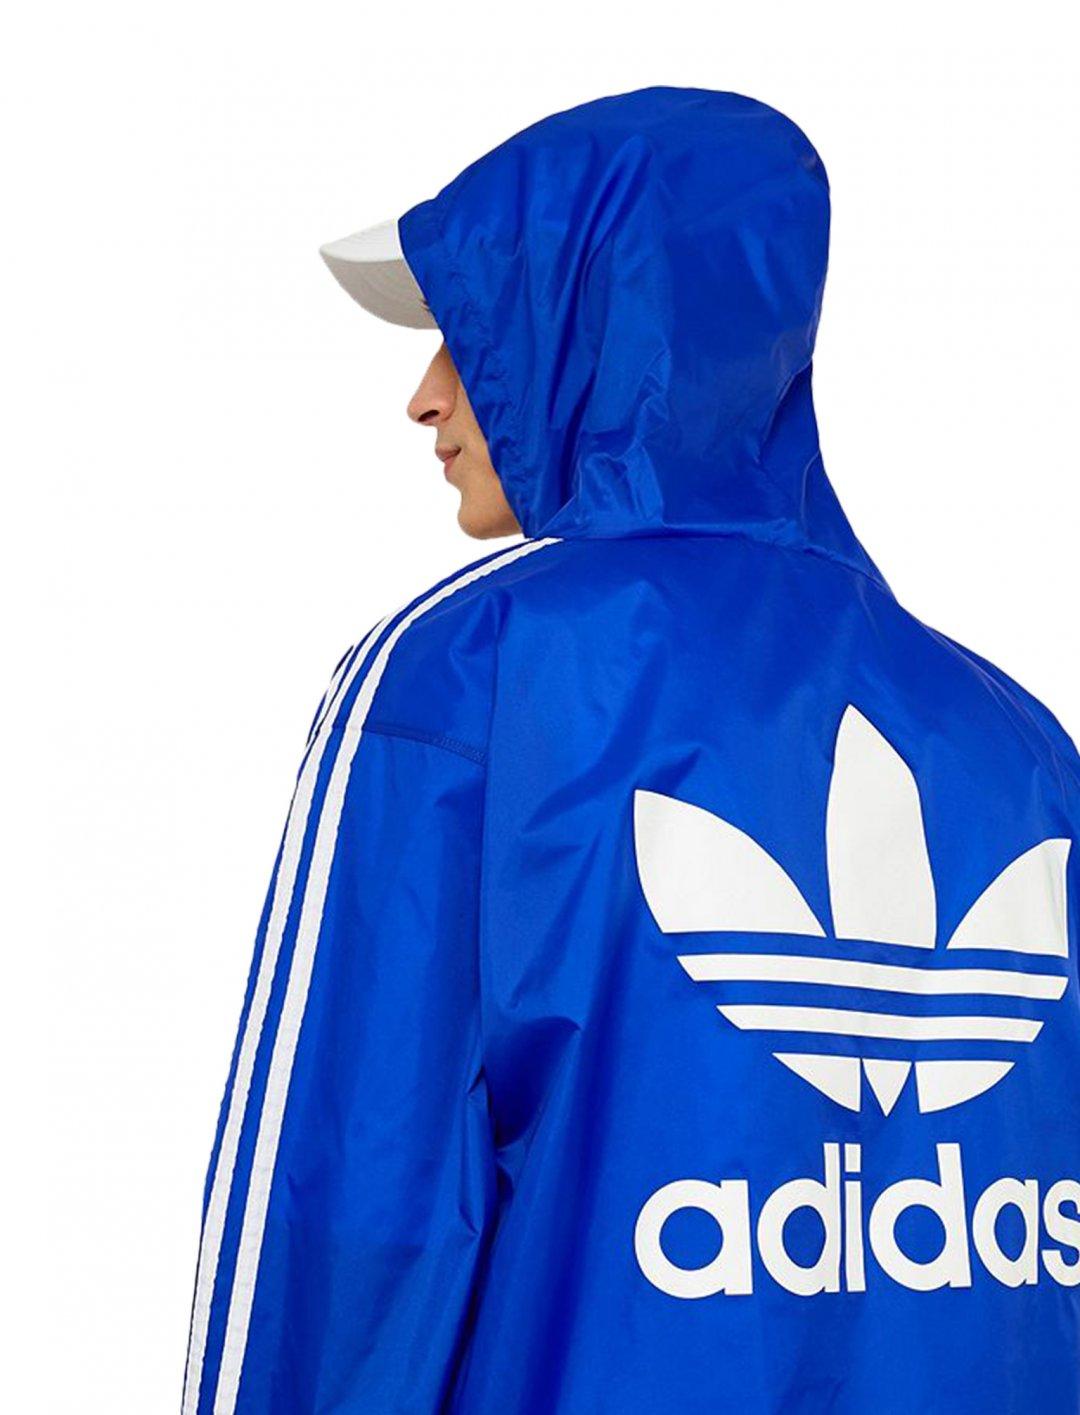 "Adidas Windbreaker Jacket {""id"":5,""product_section_id"":1,""name"":""Clothing"",""order"":5} Adidas"